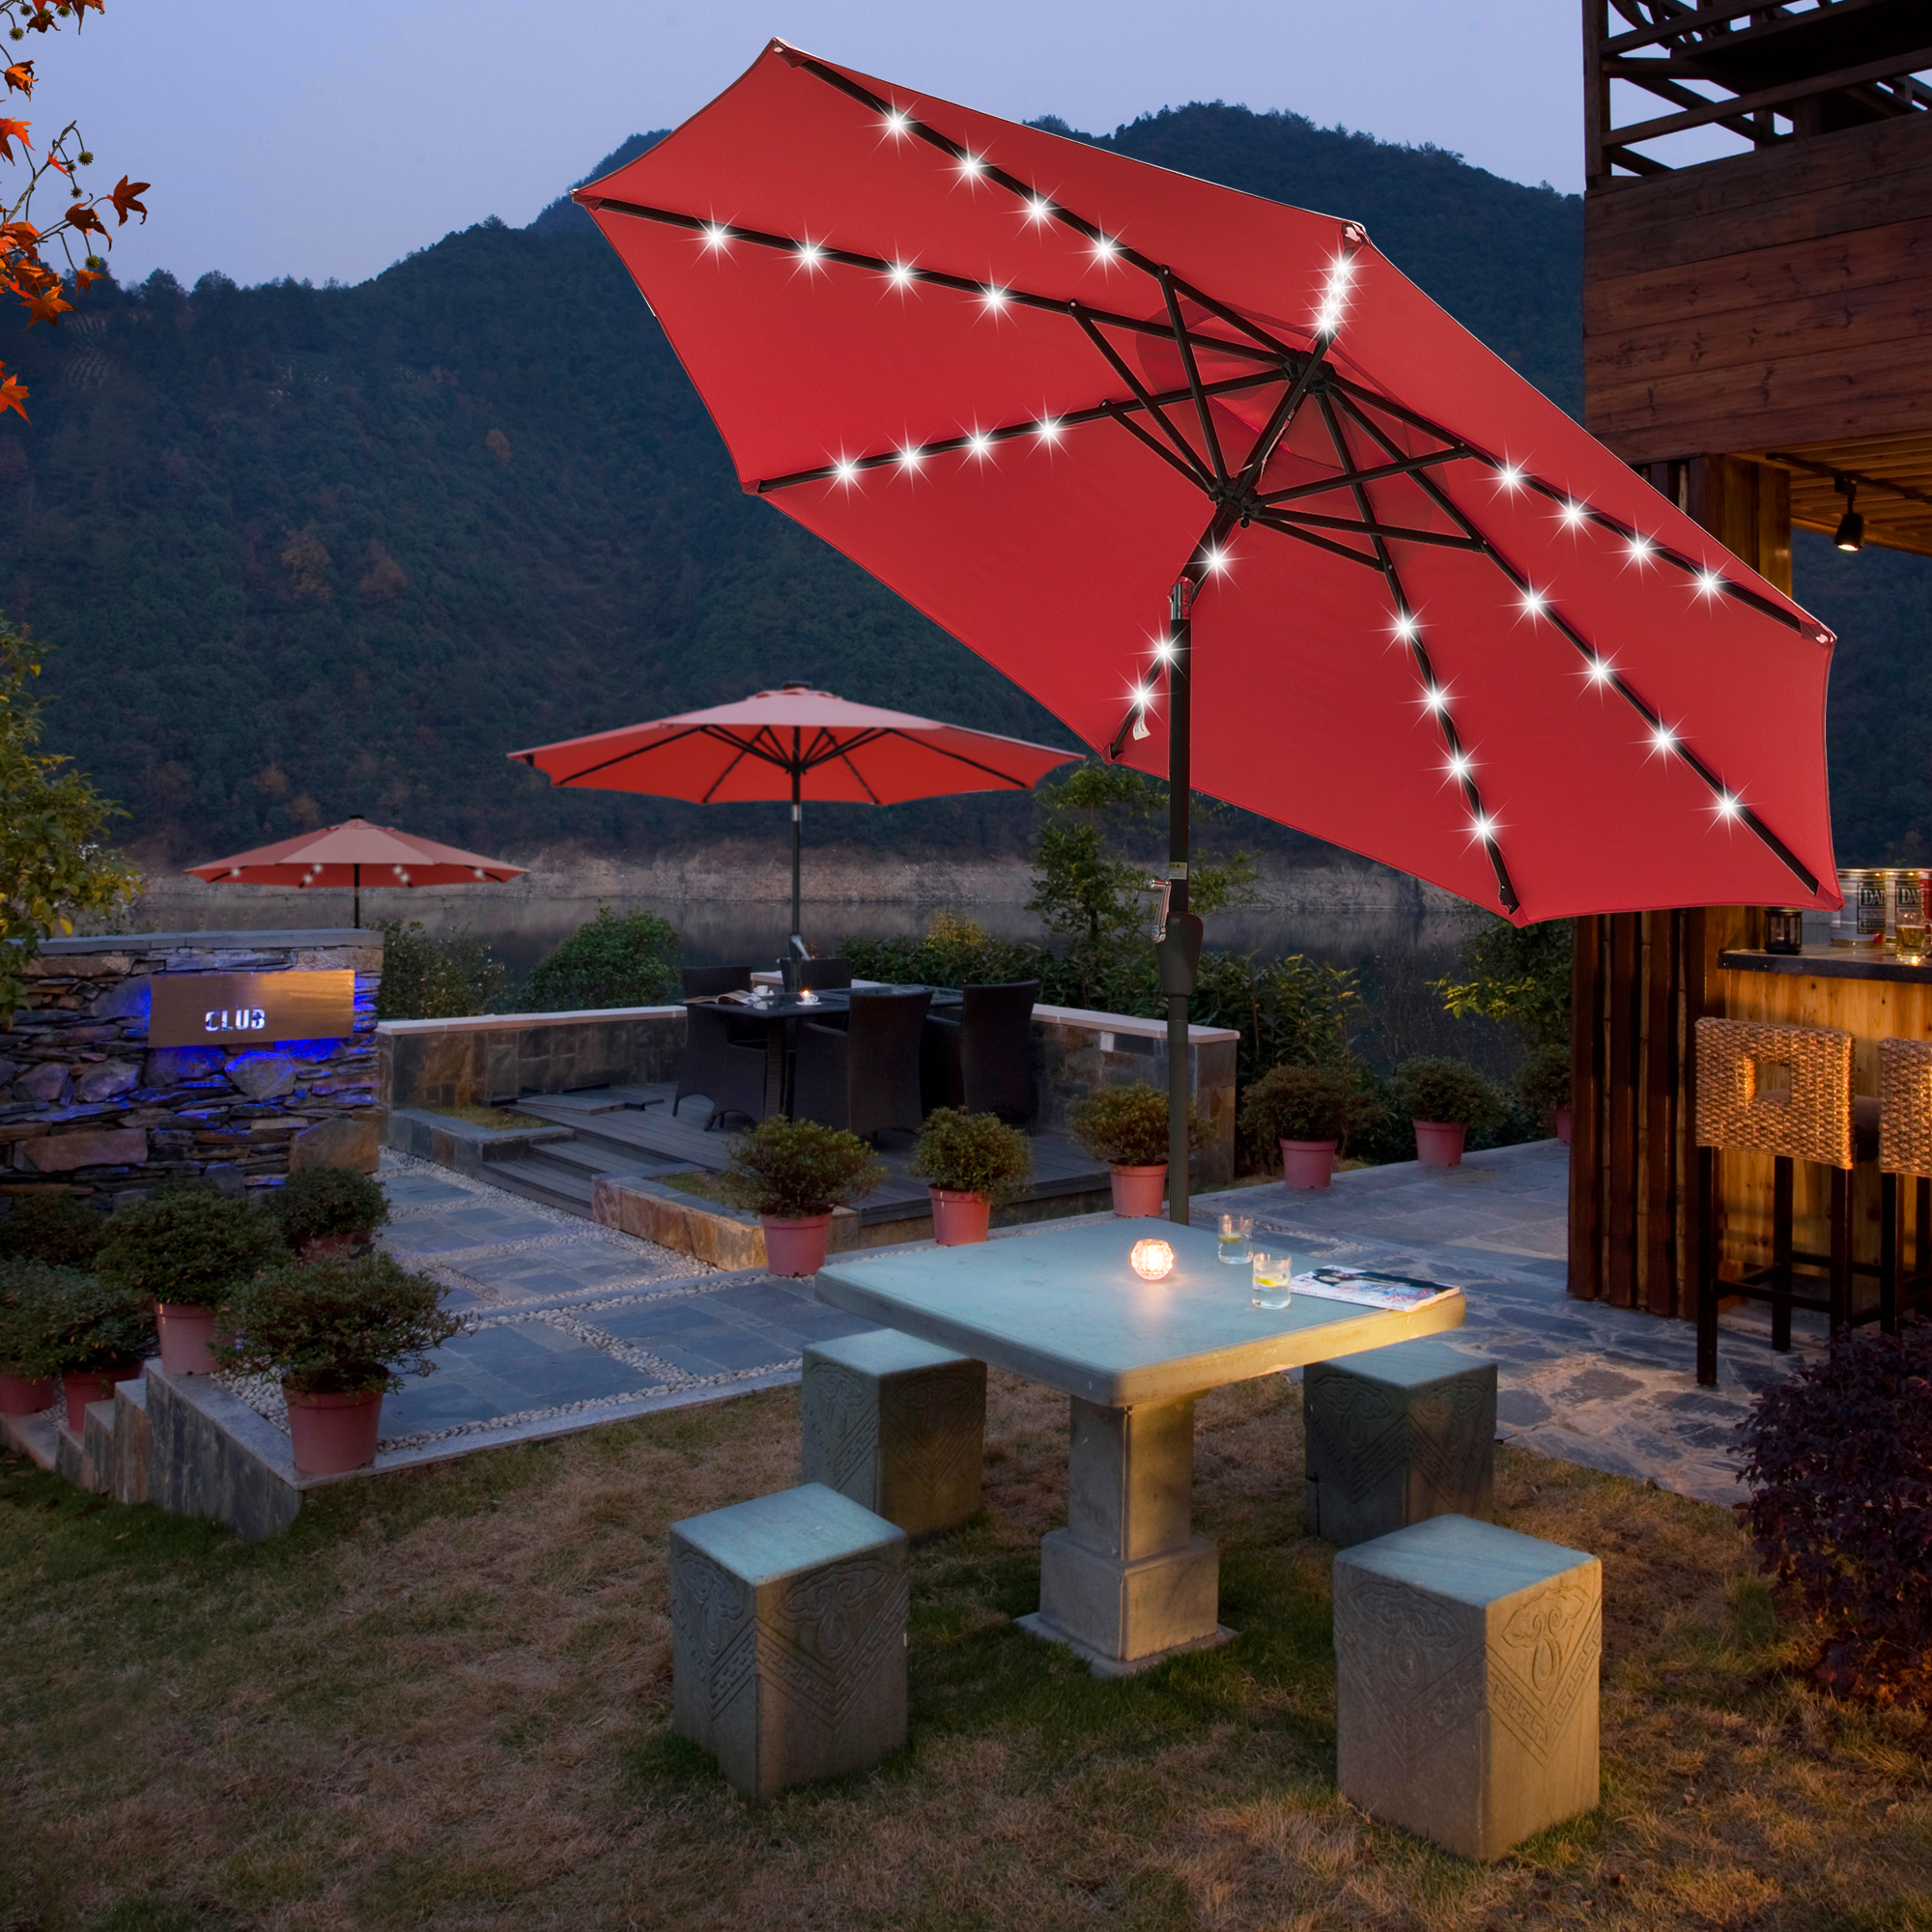 thumbnail 54 - 9' Patio Outdoor Umbrella Solar LED 8 Rib Garden Parasol Yard Deck Table Shade